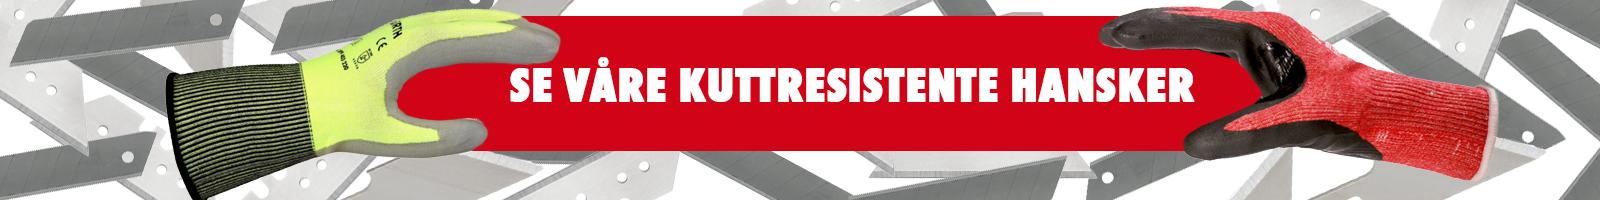 cta-kutt-blogg